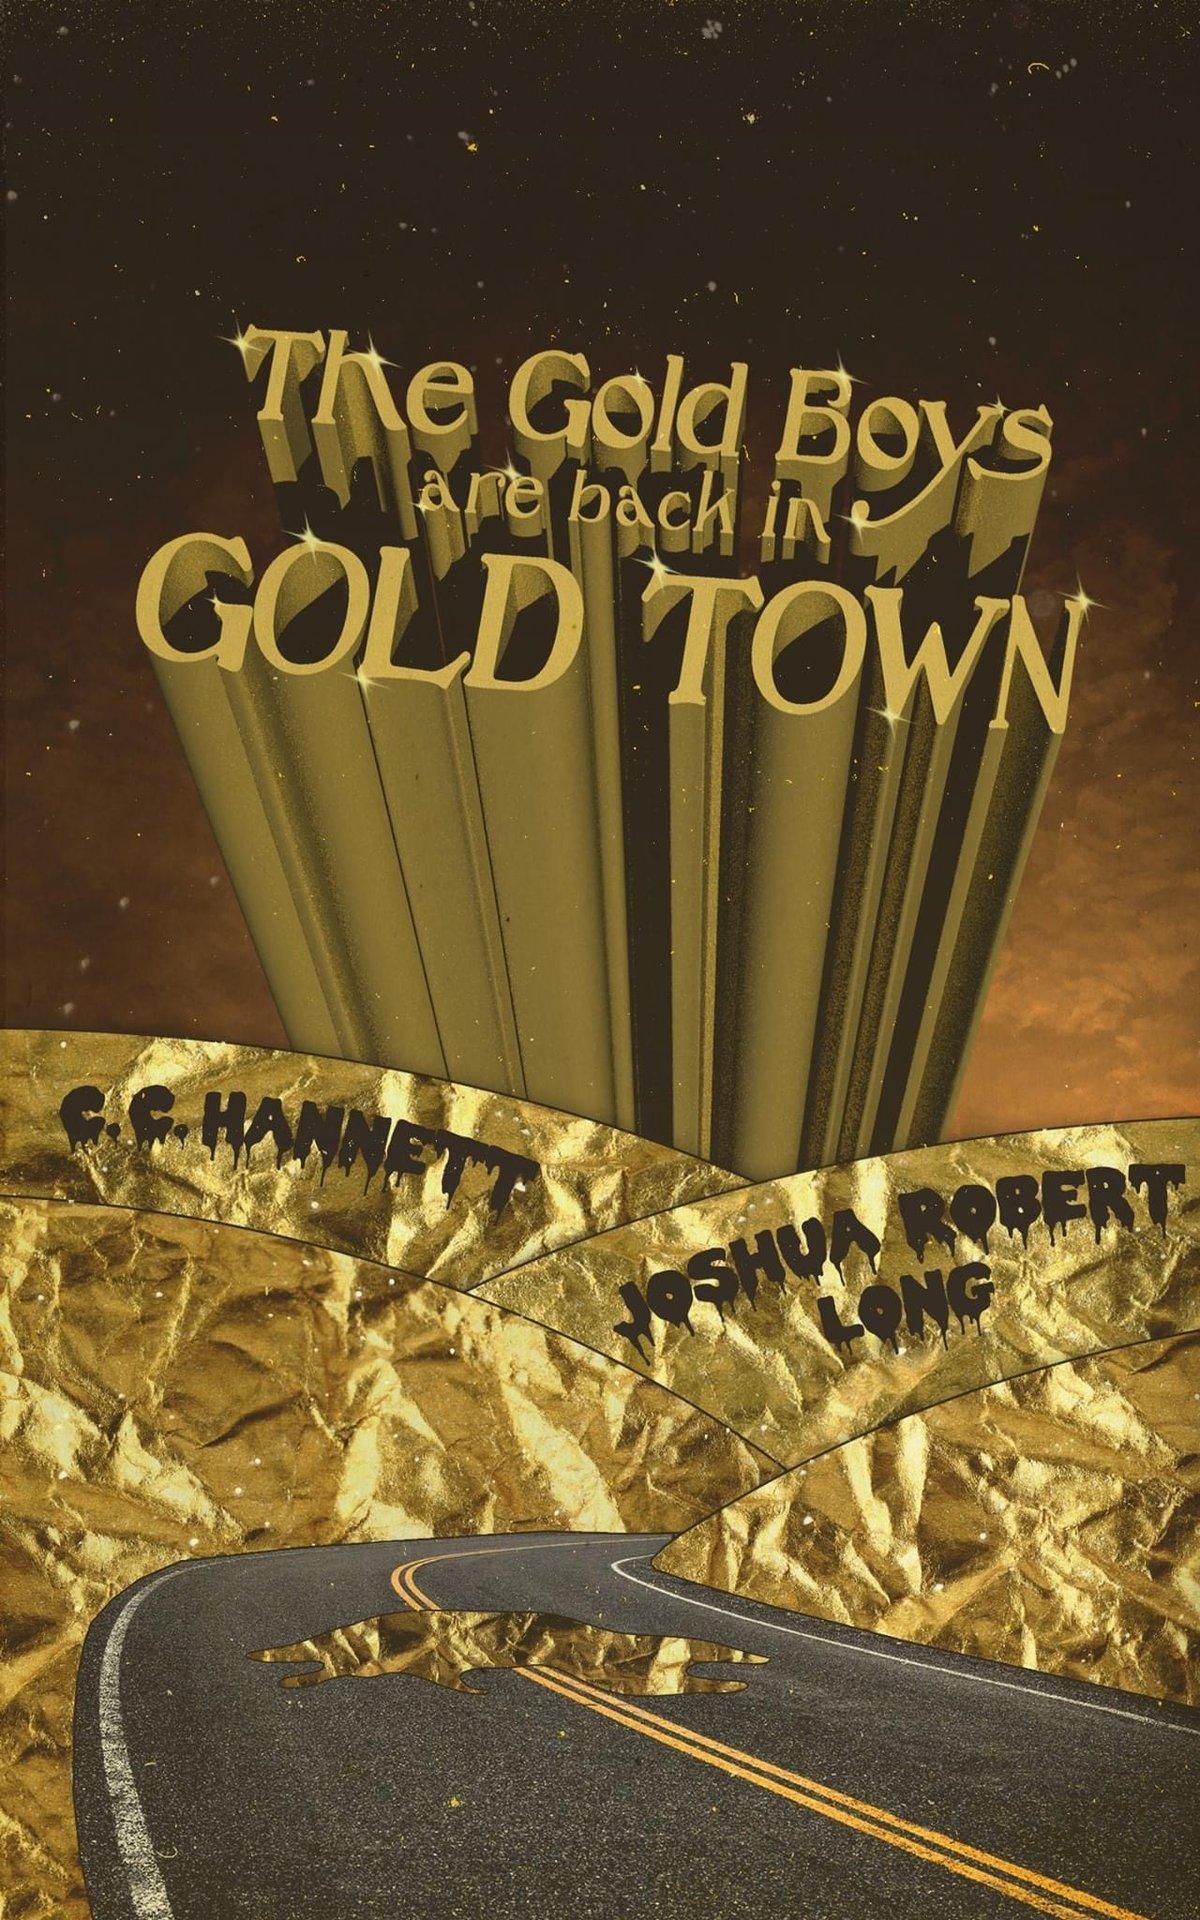 The Gold Boys Are Back In Gold Town - Joshua Robert Long + C. C. Hannett